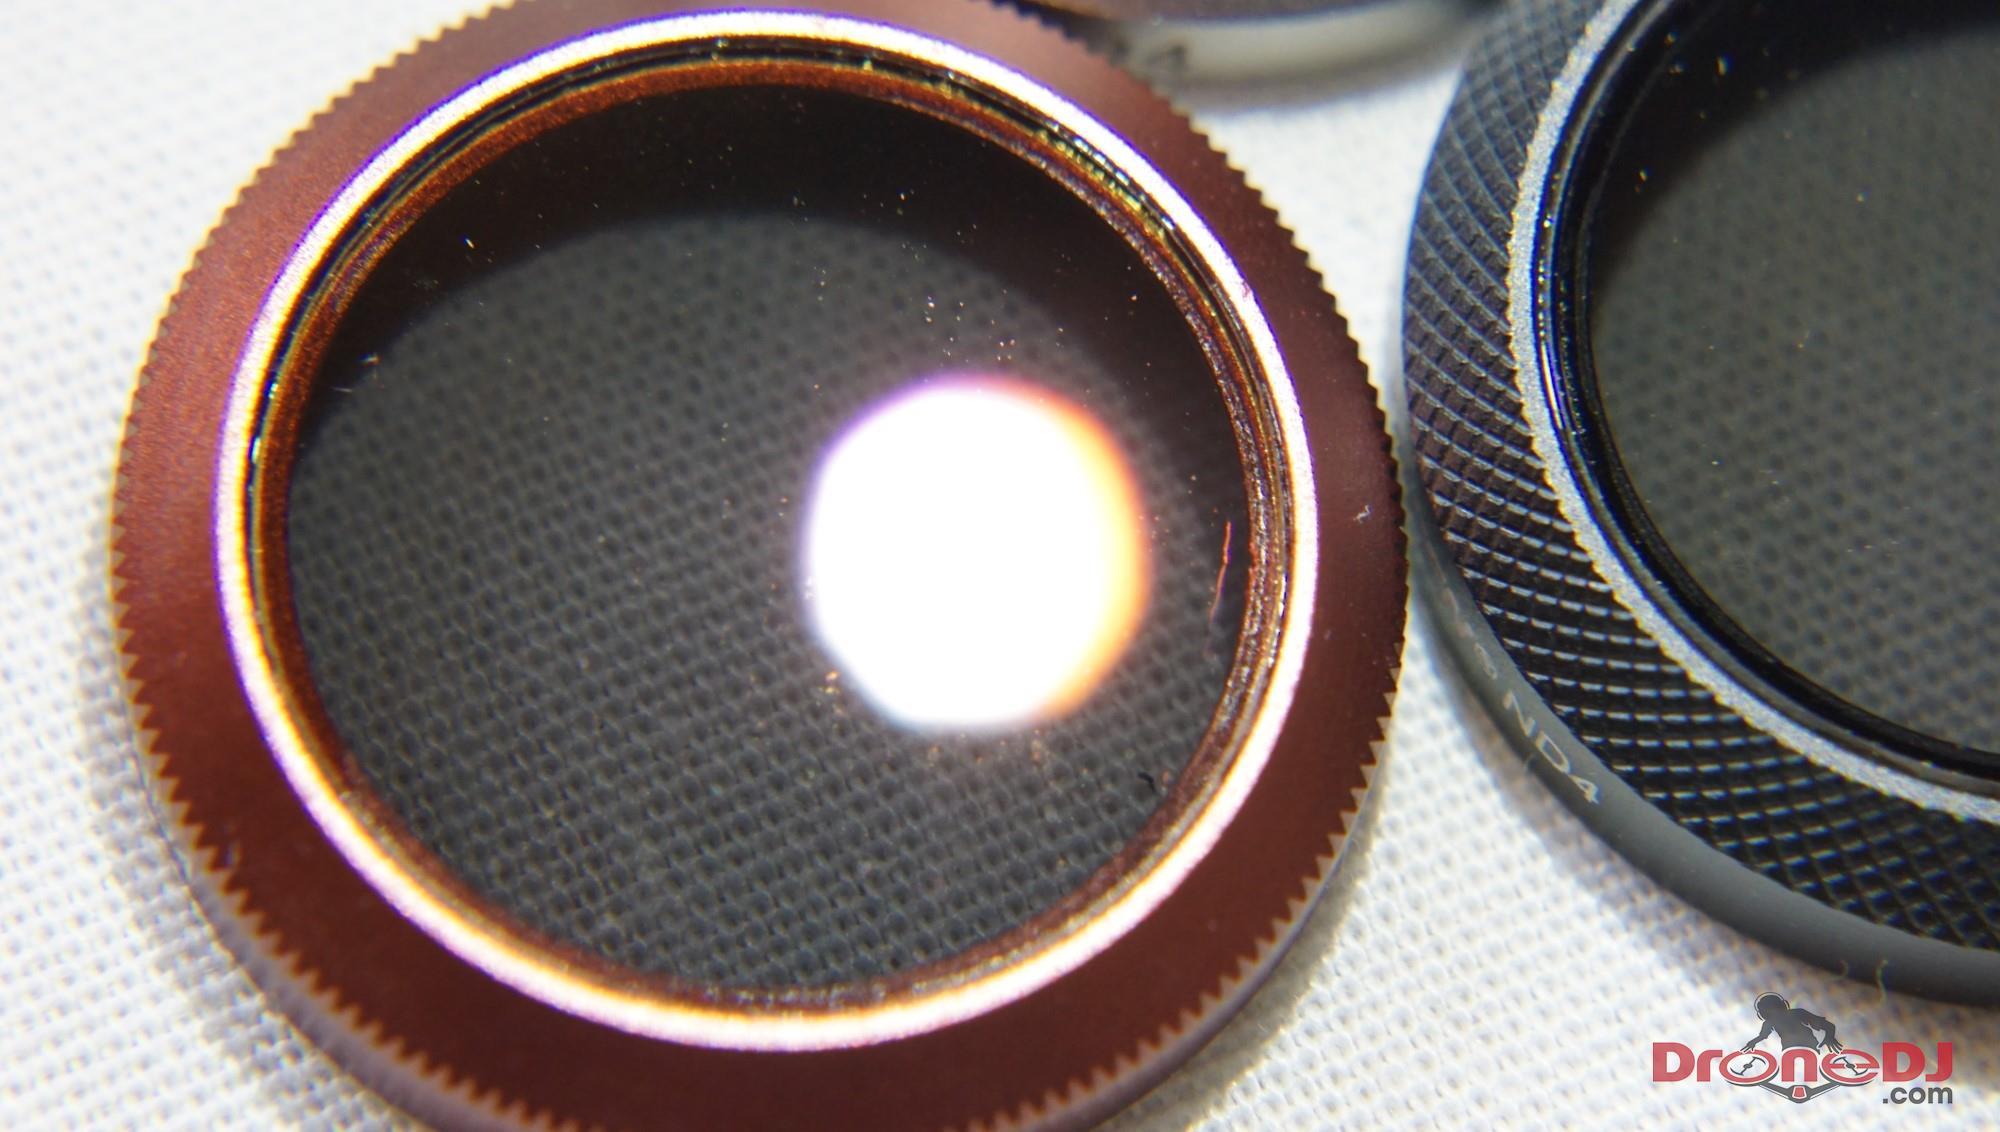 mavic 2 filter scratch test